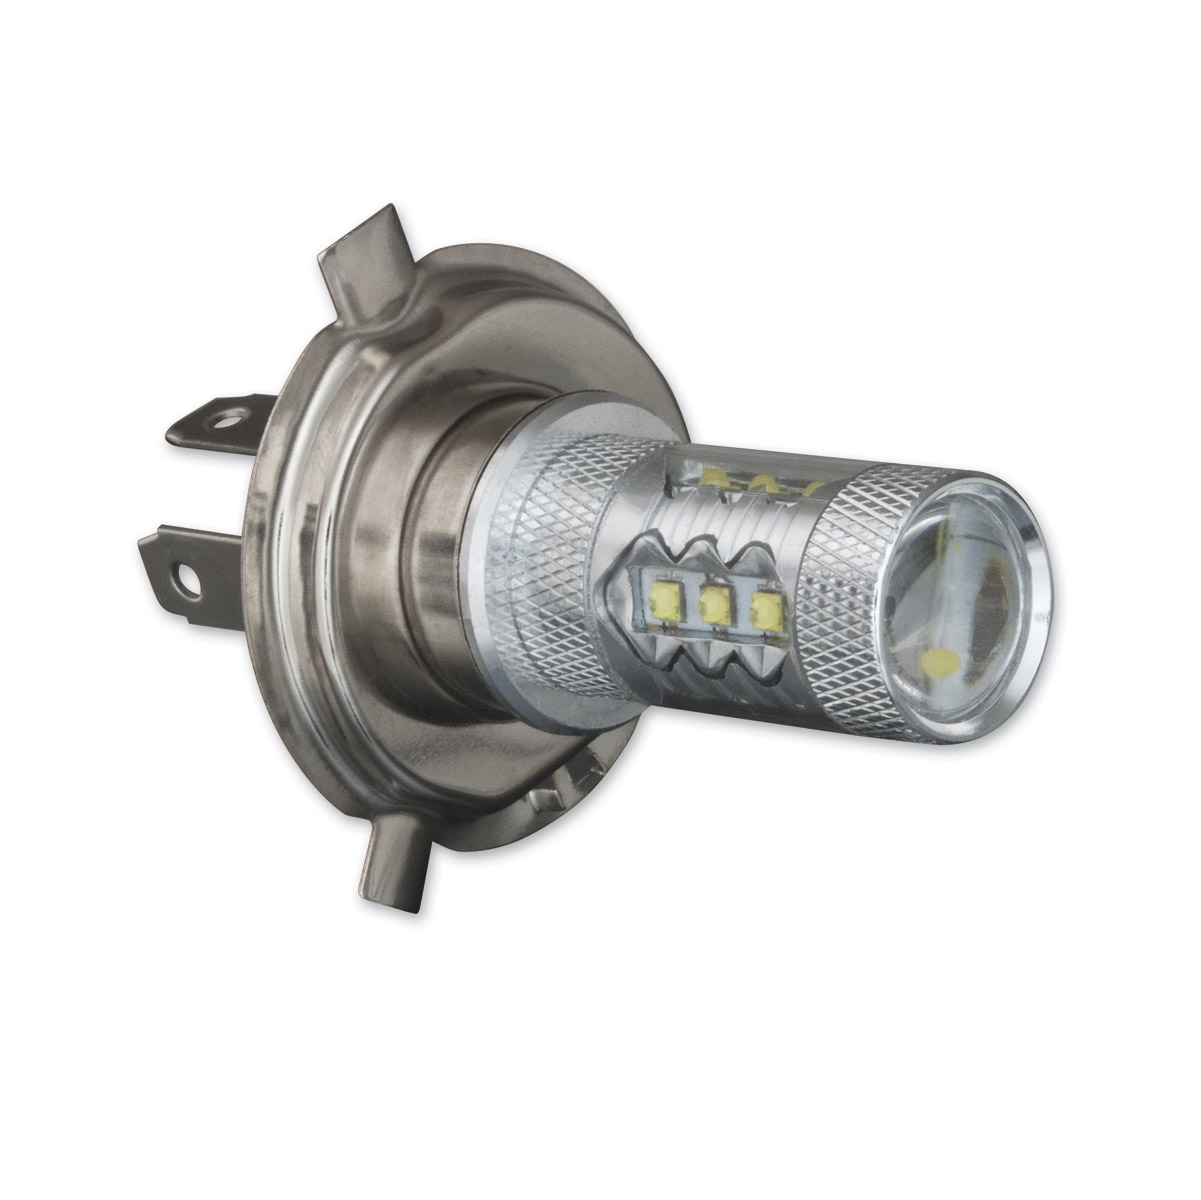 h4 halogen bulb wiring diagram 120v to 12v transformer led bulbs direct get free image about